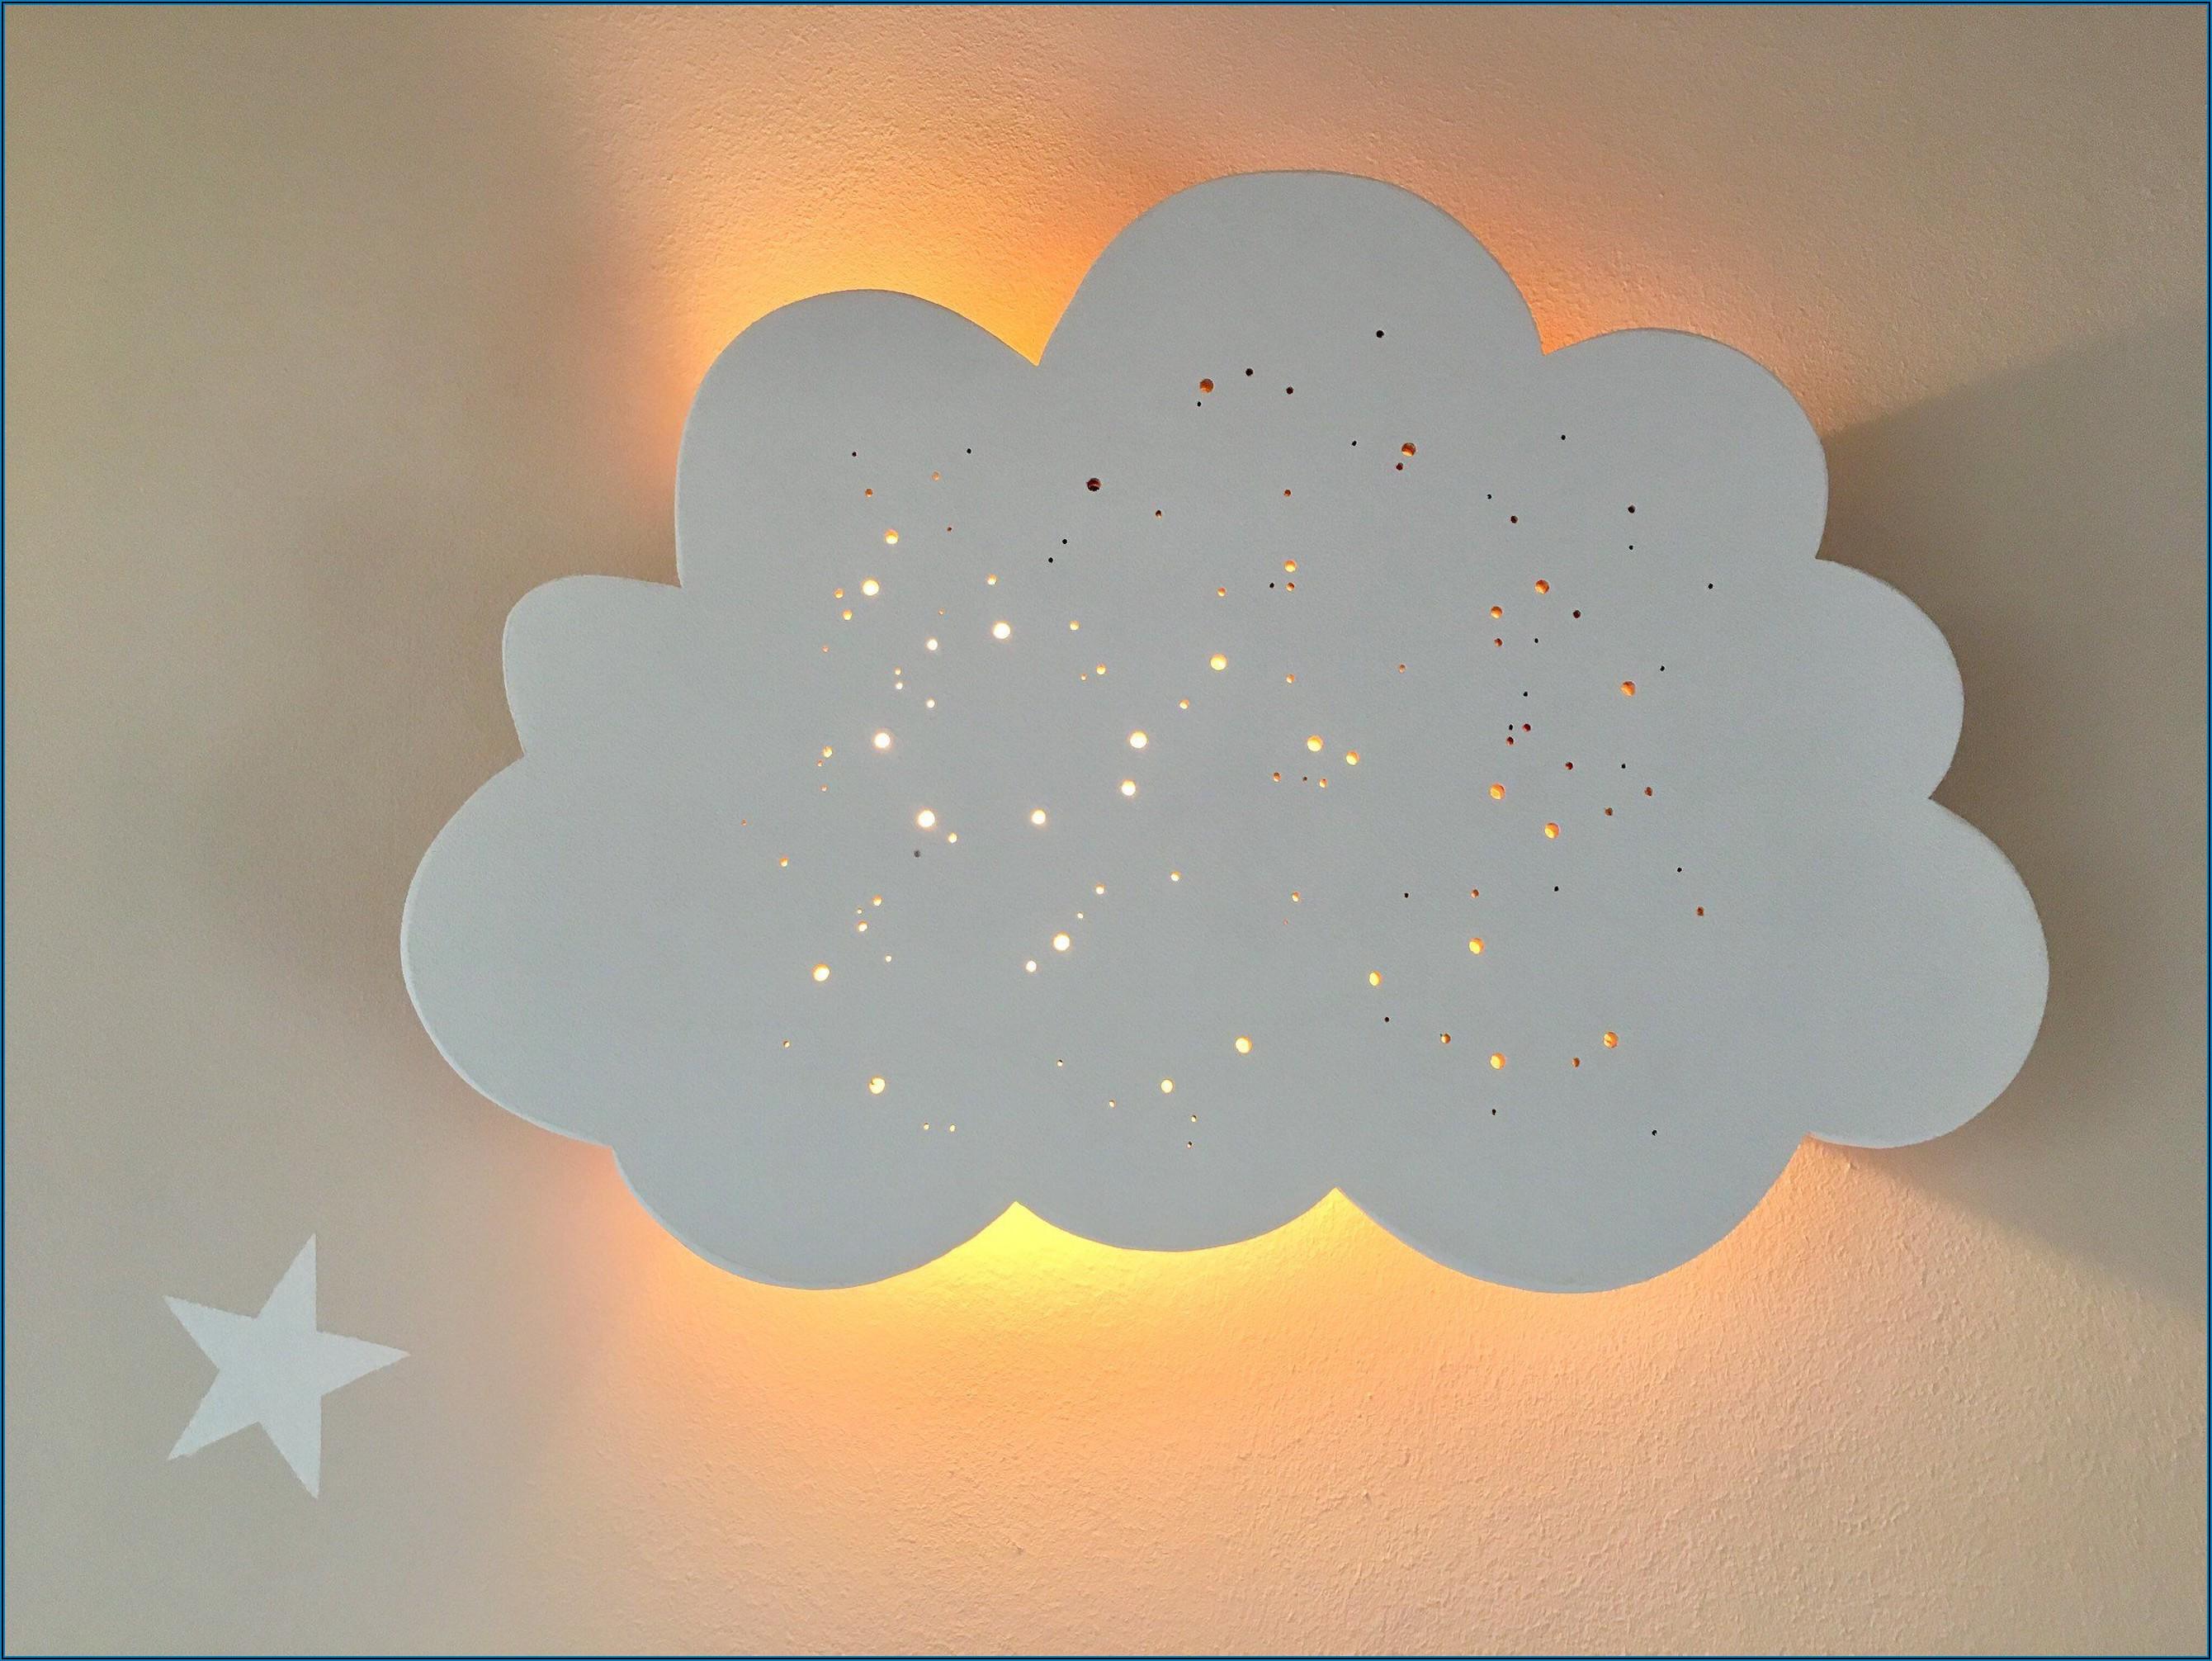 Wandlampe Kinderzimmer Selber Basteln